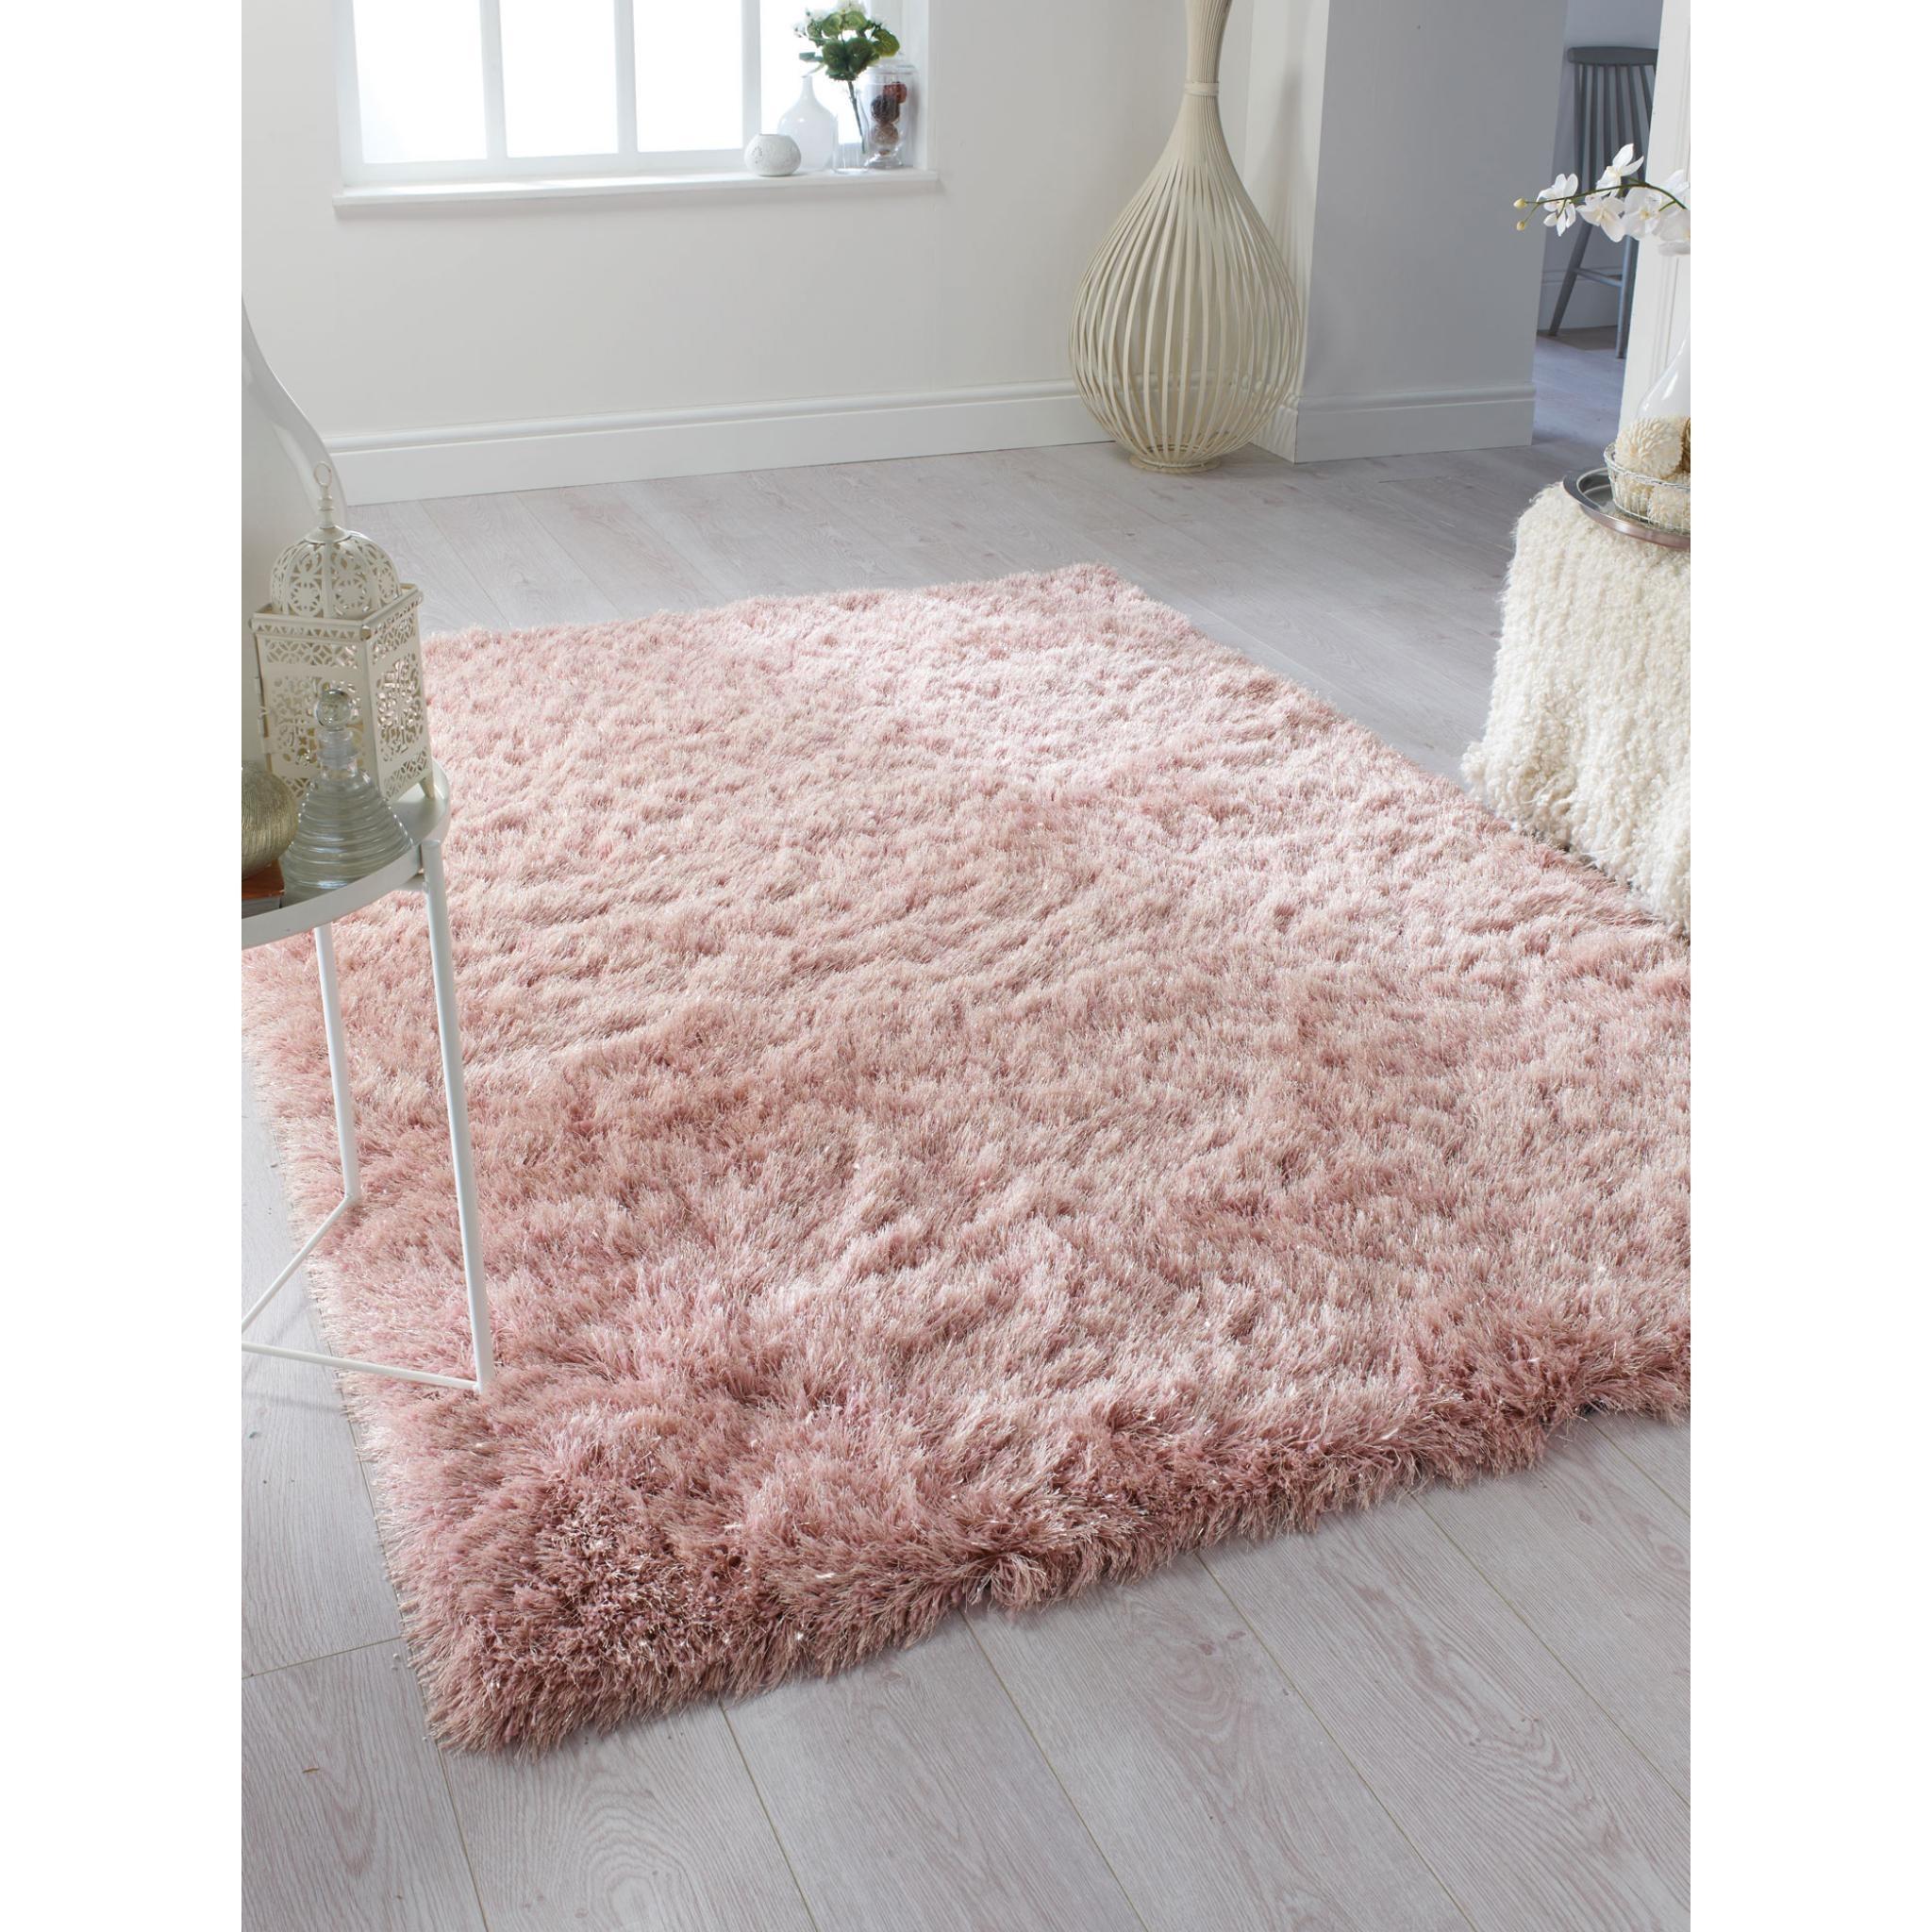 Flair Rugs Dazzle Blush Pink Plain Shaggy Sparkle Rug - 120 x 170 cm